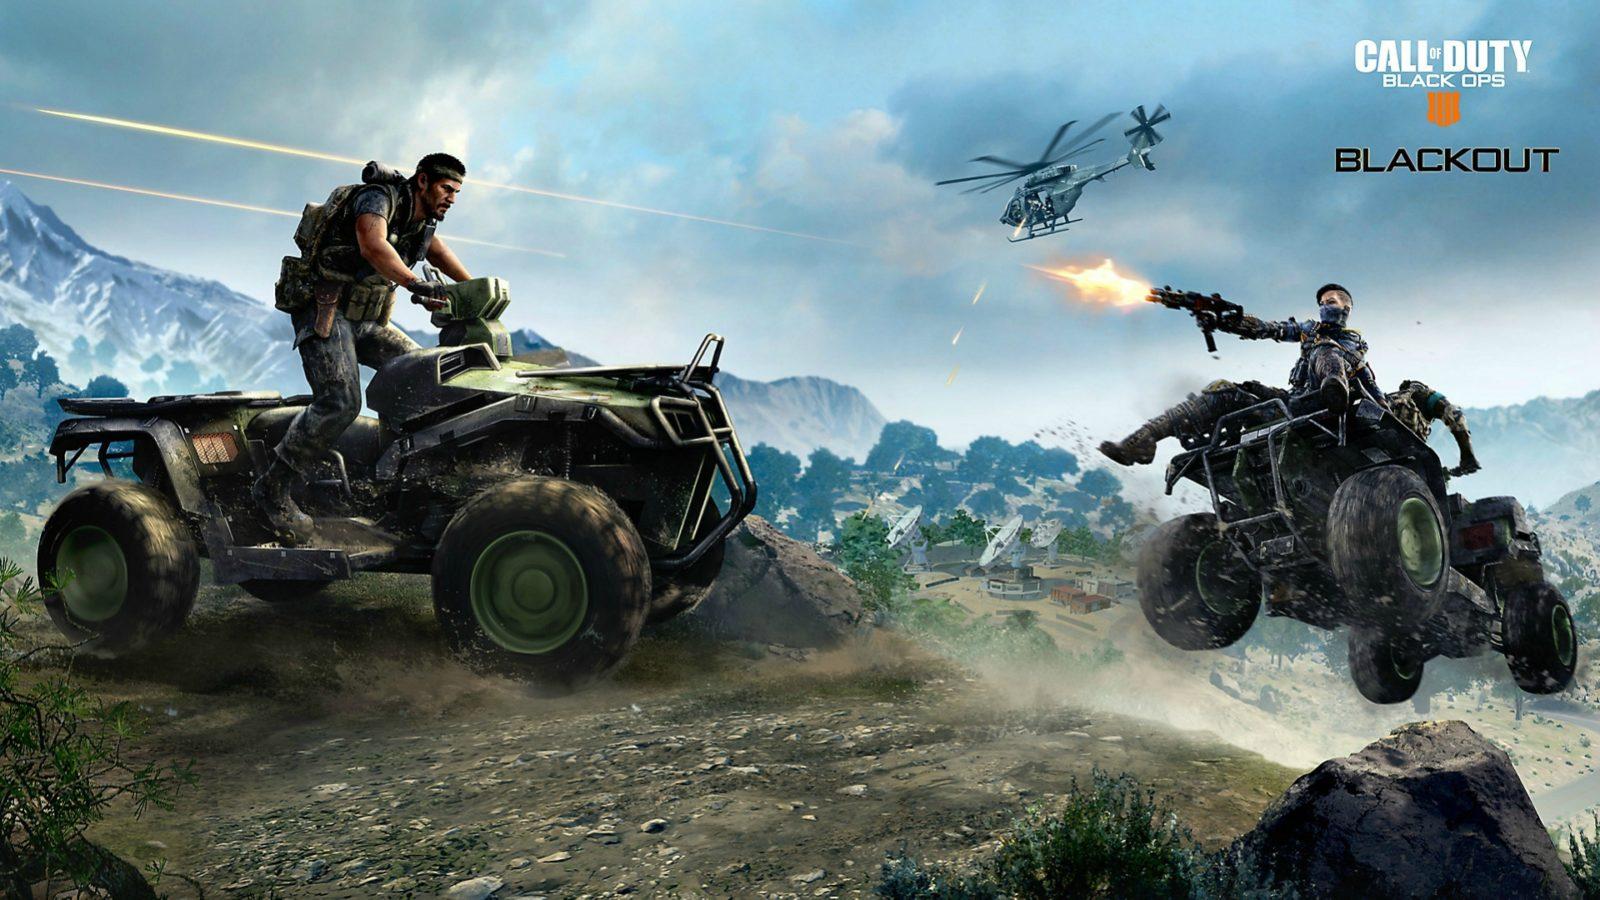 Call Of Duty Black Ops 4 Blackout Desktop Wallpapers Computer